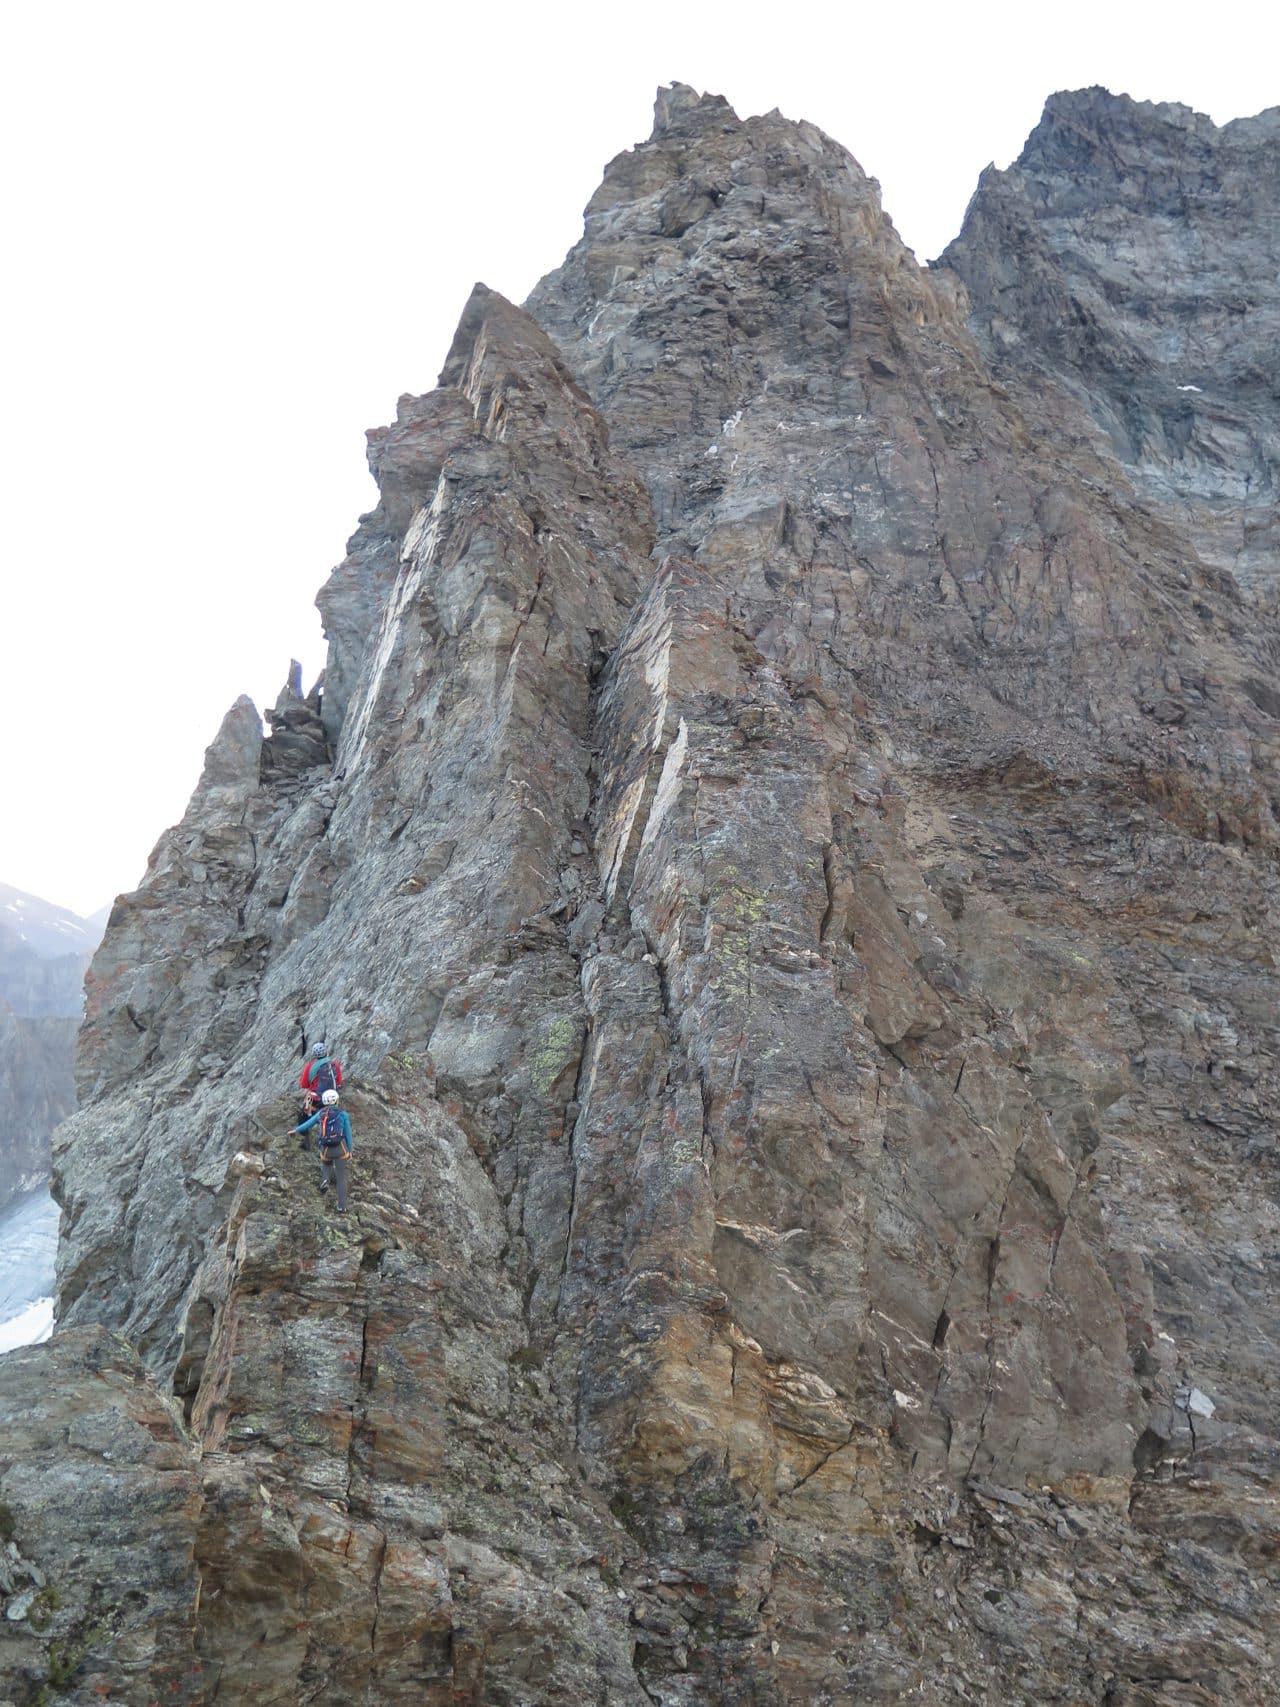 arete-de-tseudet-velan-valais-helyum-xavier-carrard-guide-de-montagne-geneve